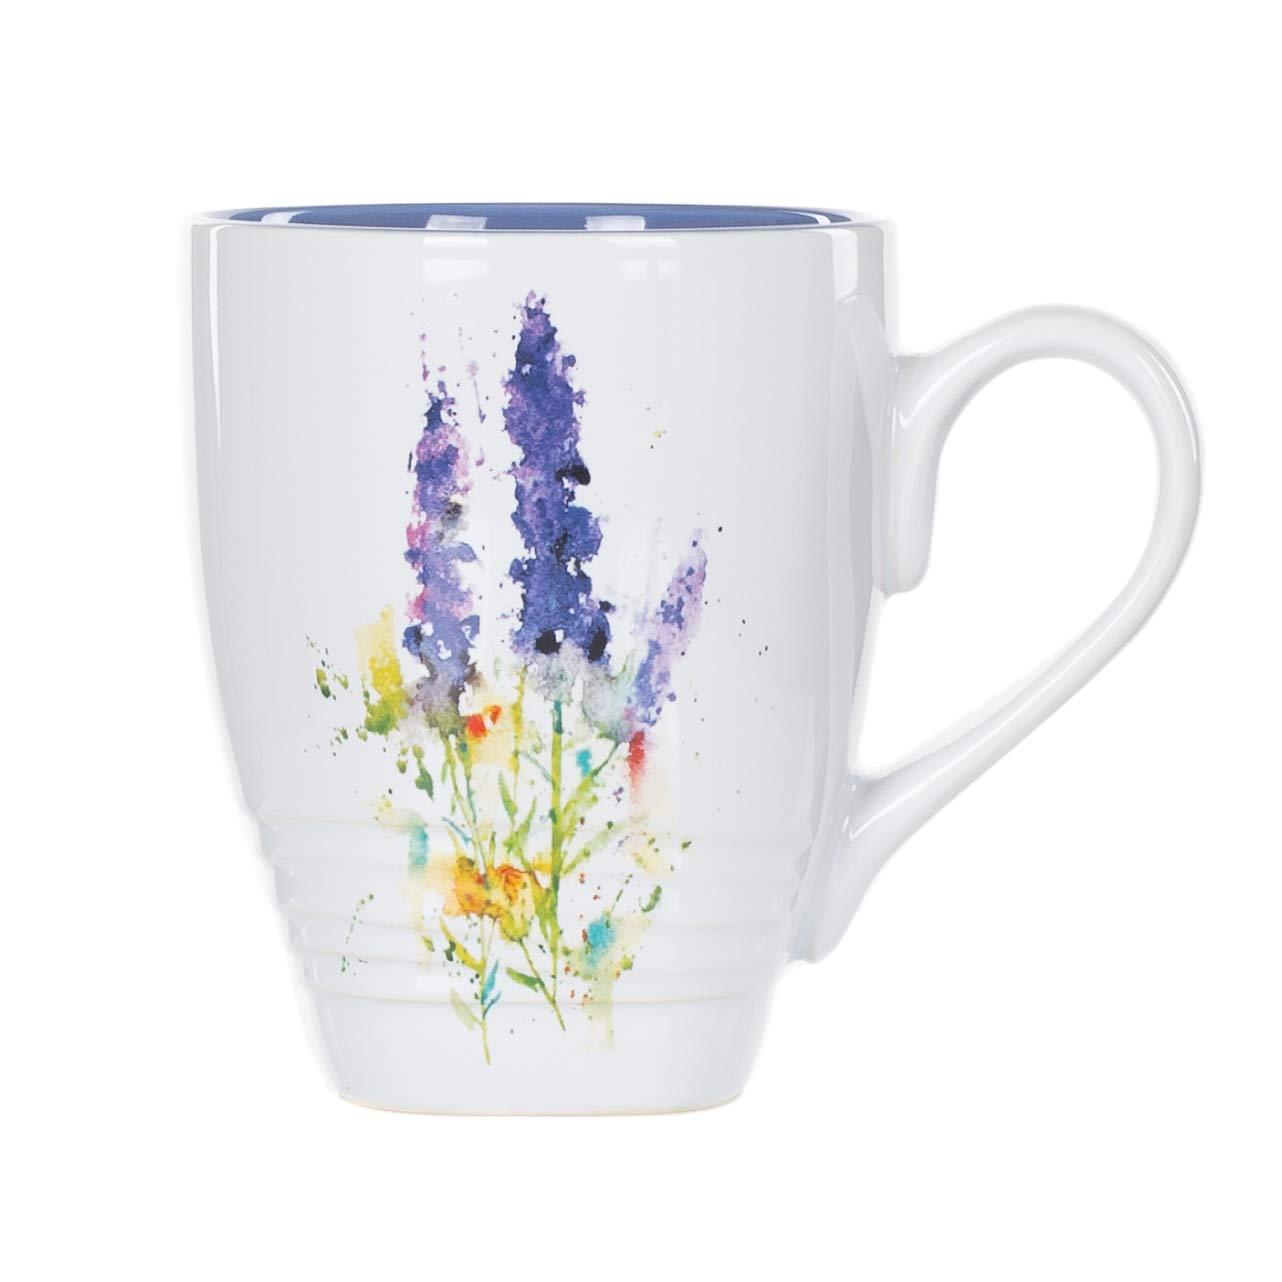 Dean Crouser Lavender Herbal Floral Watercolor Blue 16 ounce Glossy Ceramic Stoneware Mug